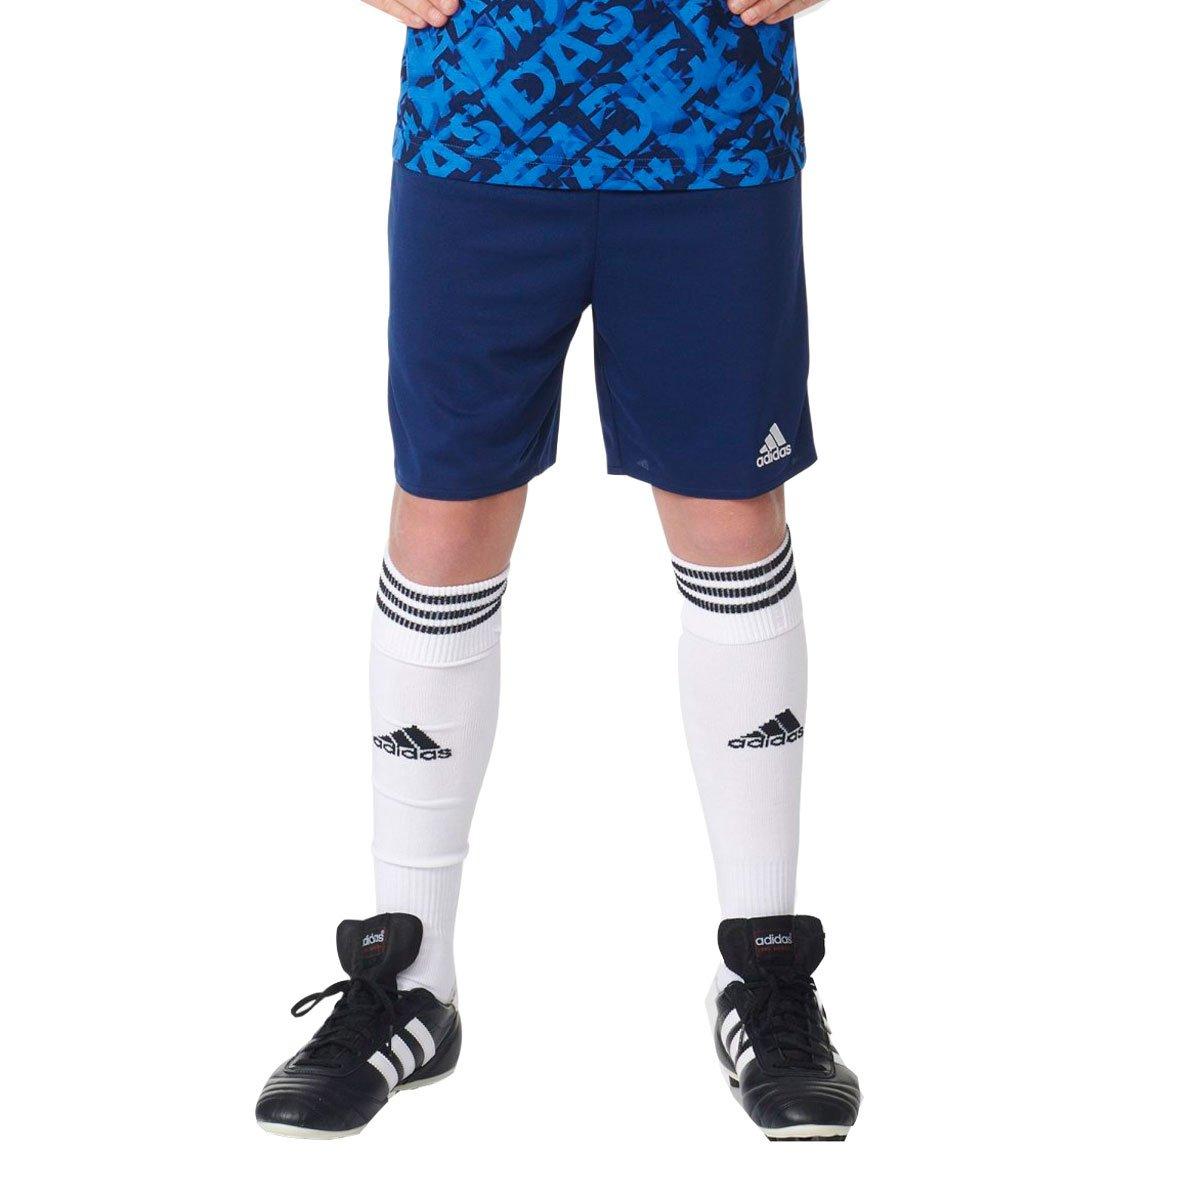 Bizz Store - Shorts Infantil Masculino Adidas Parma 16 Preto 64e4838f9f6d8